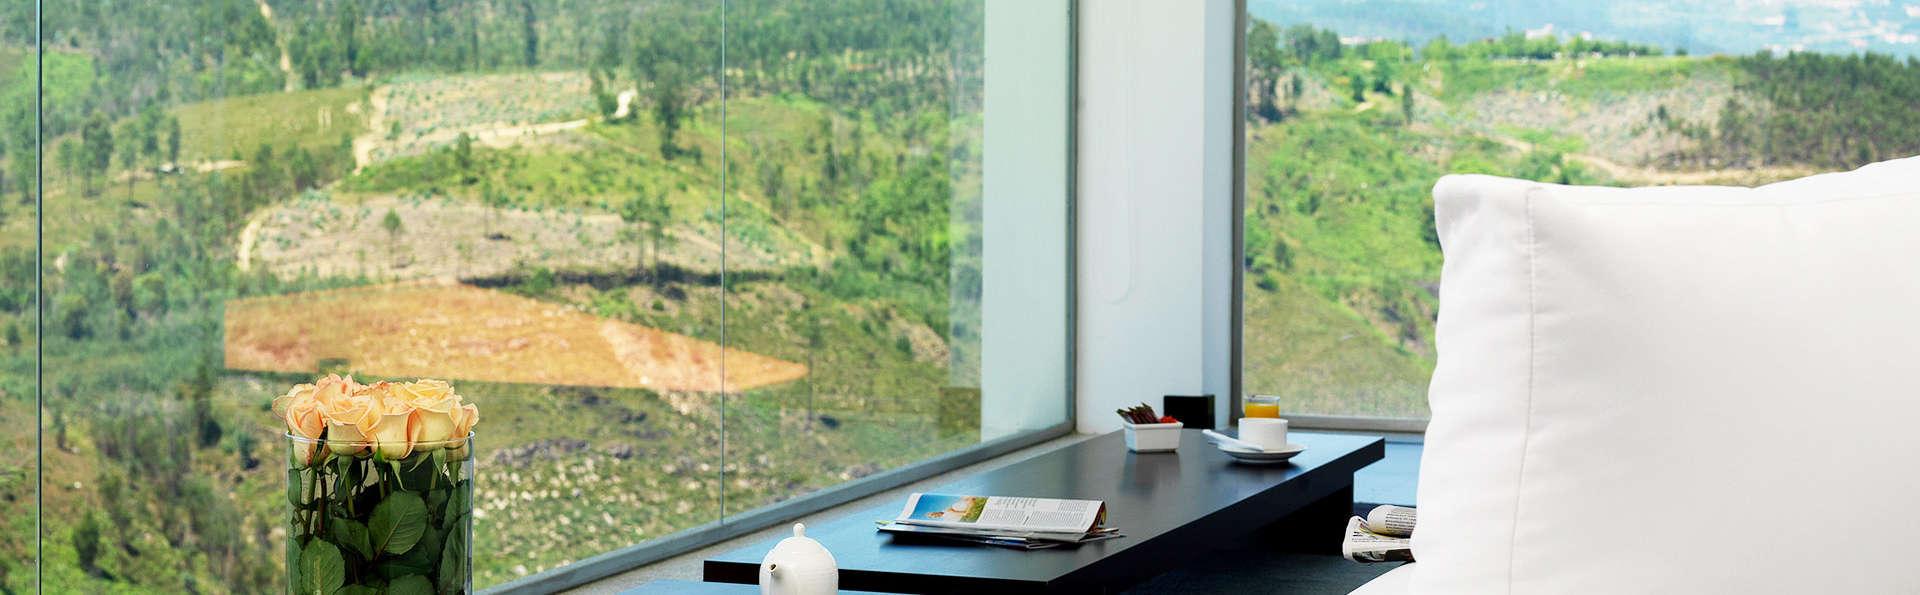 Agua Hotels Mondim de Basto - EDIT_detailroom.jpg